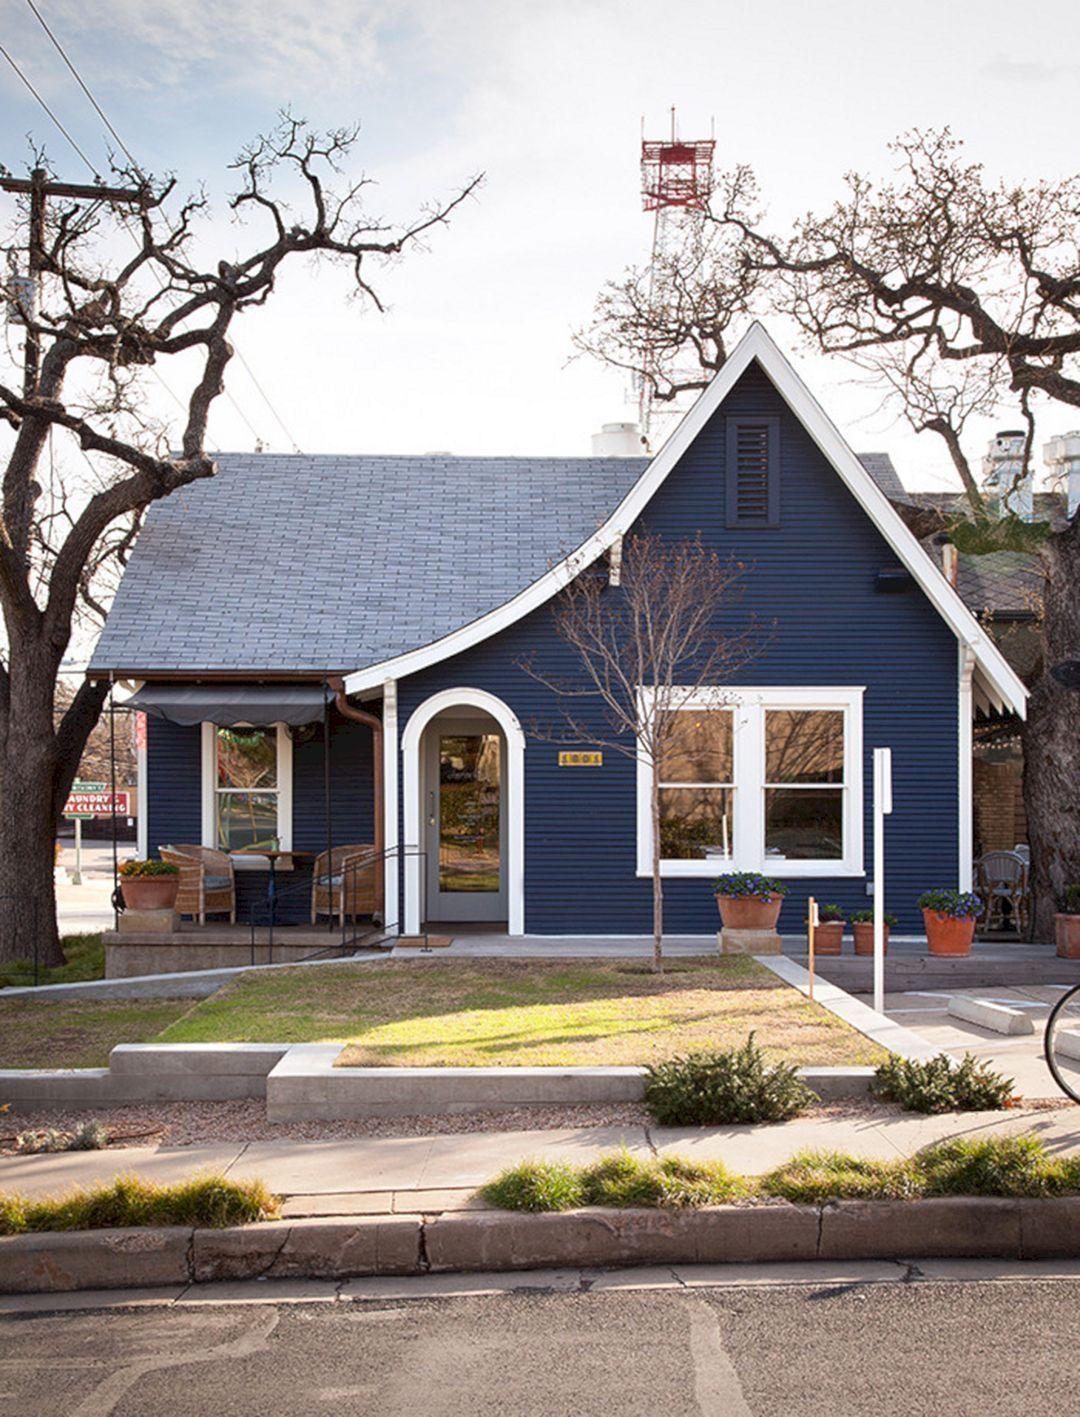 Navy Blue With White Trim House Exterior Navy Blue With White Trim House Exterior Design Ideas And Photos Cottage Exterior Colors House Exterior Blue House Paint Exterior